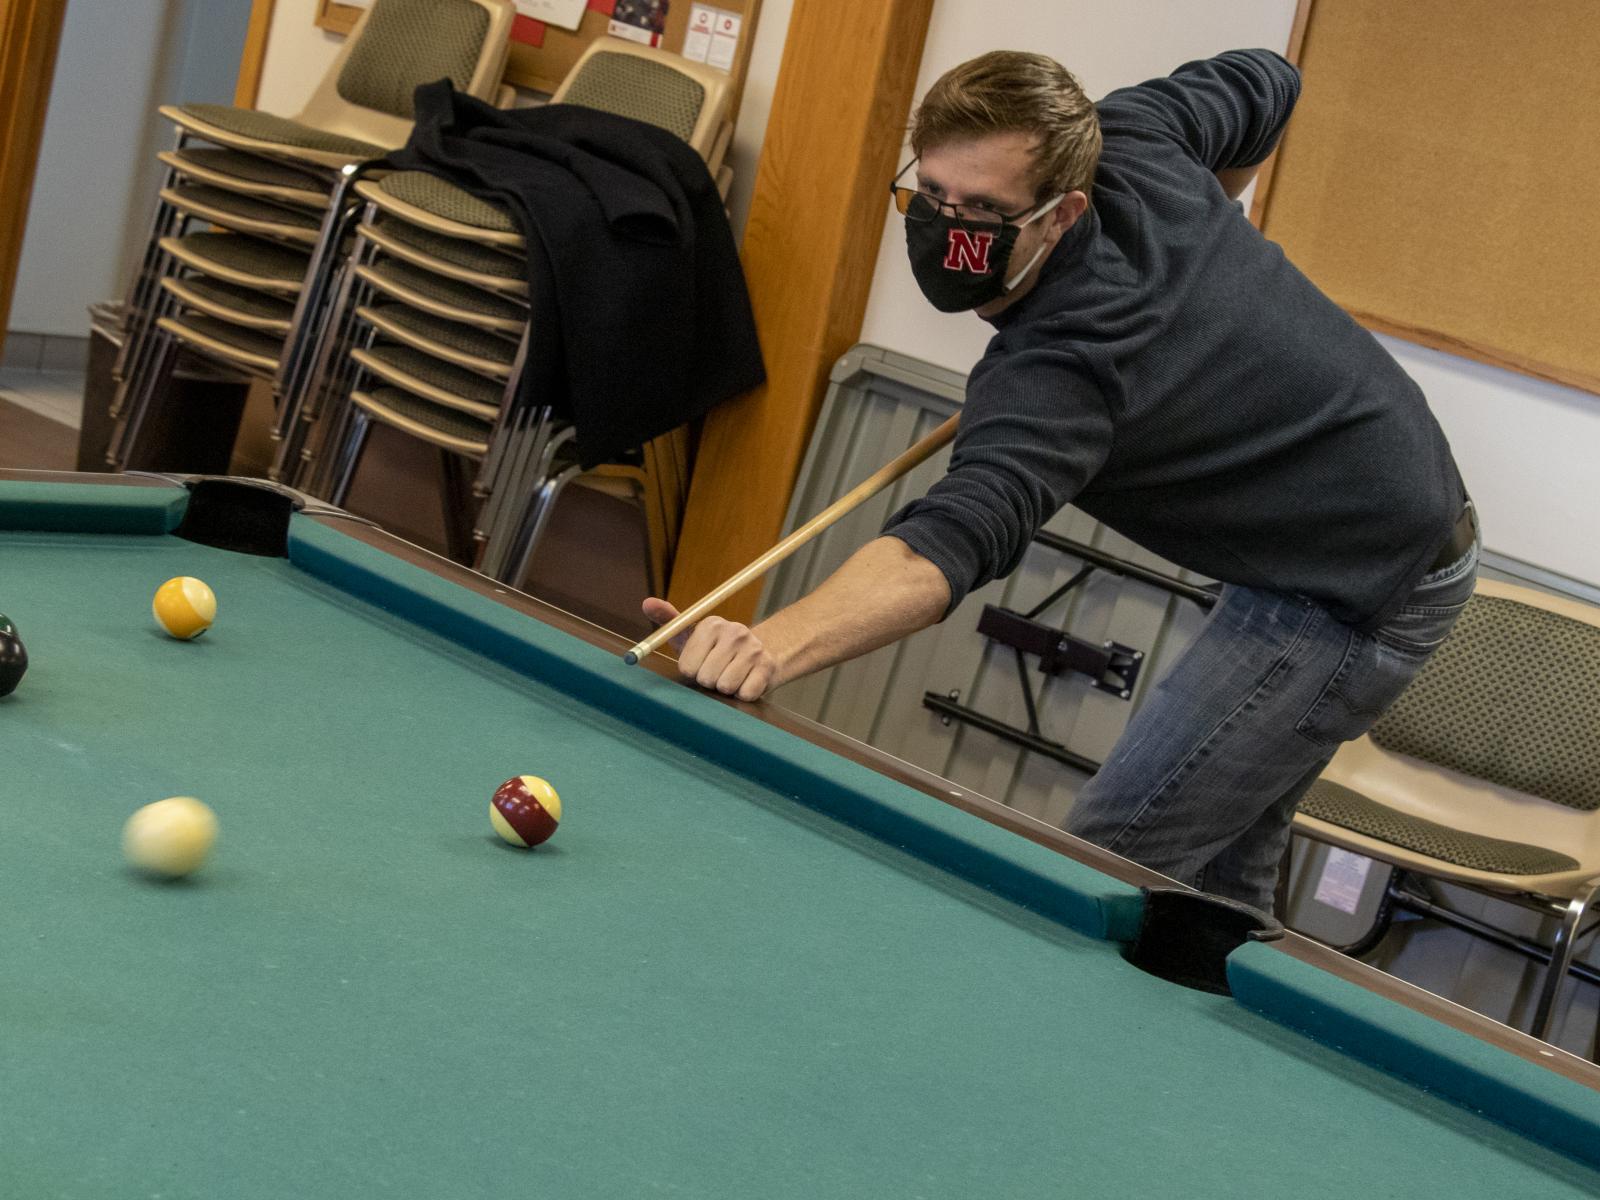 Student plays pool